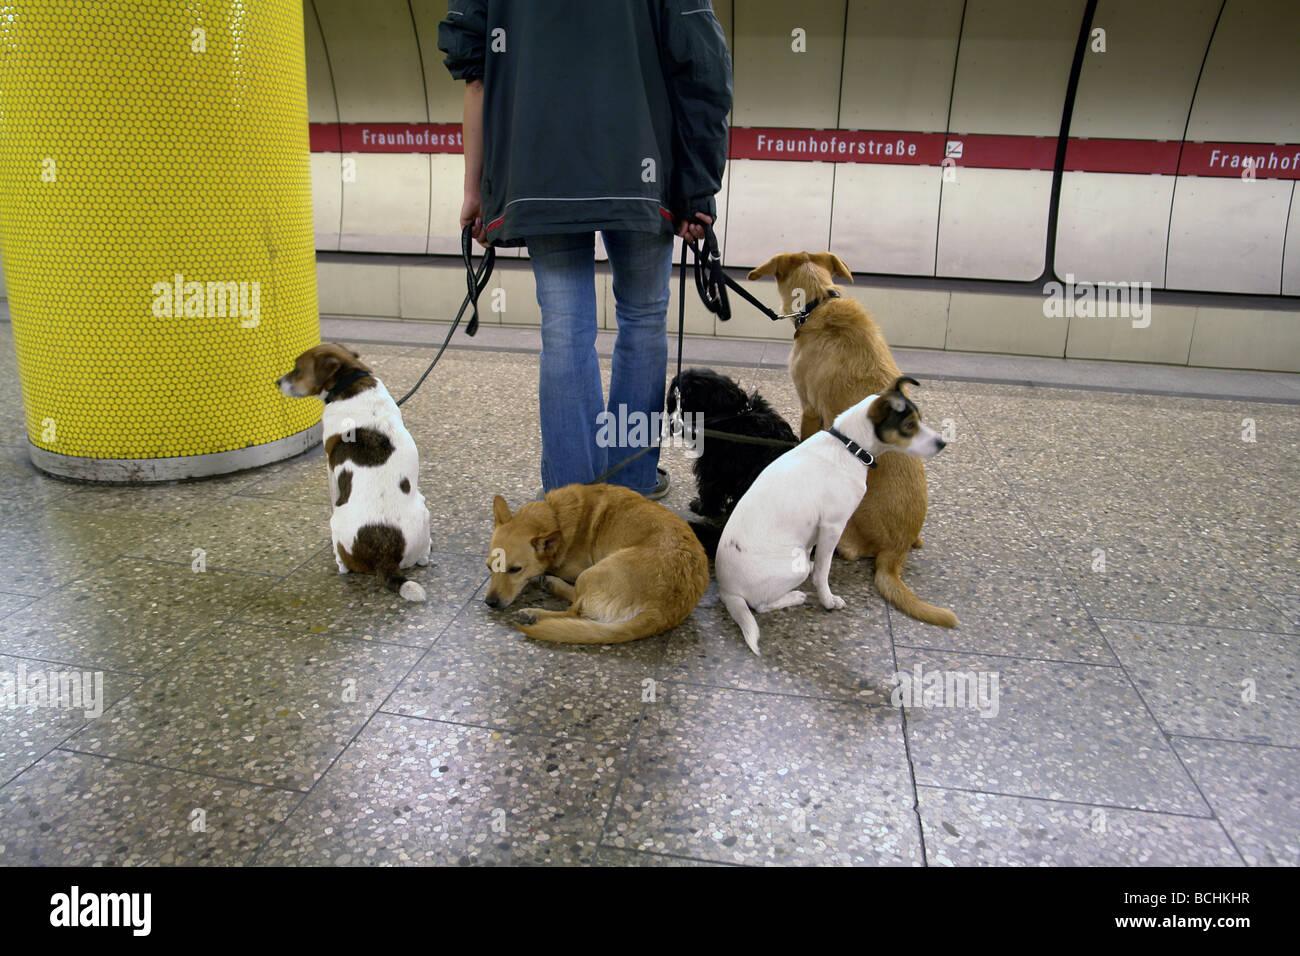 Dog Walking In Munich